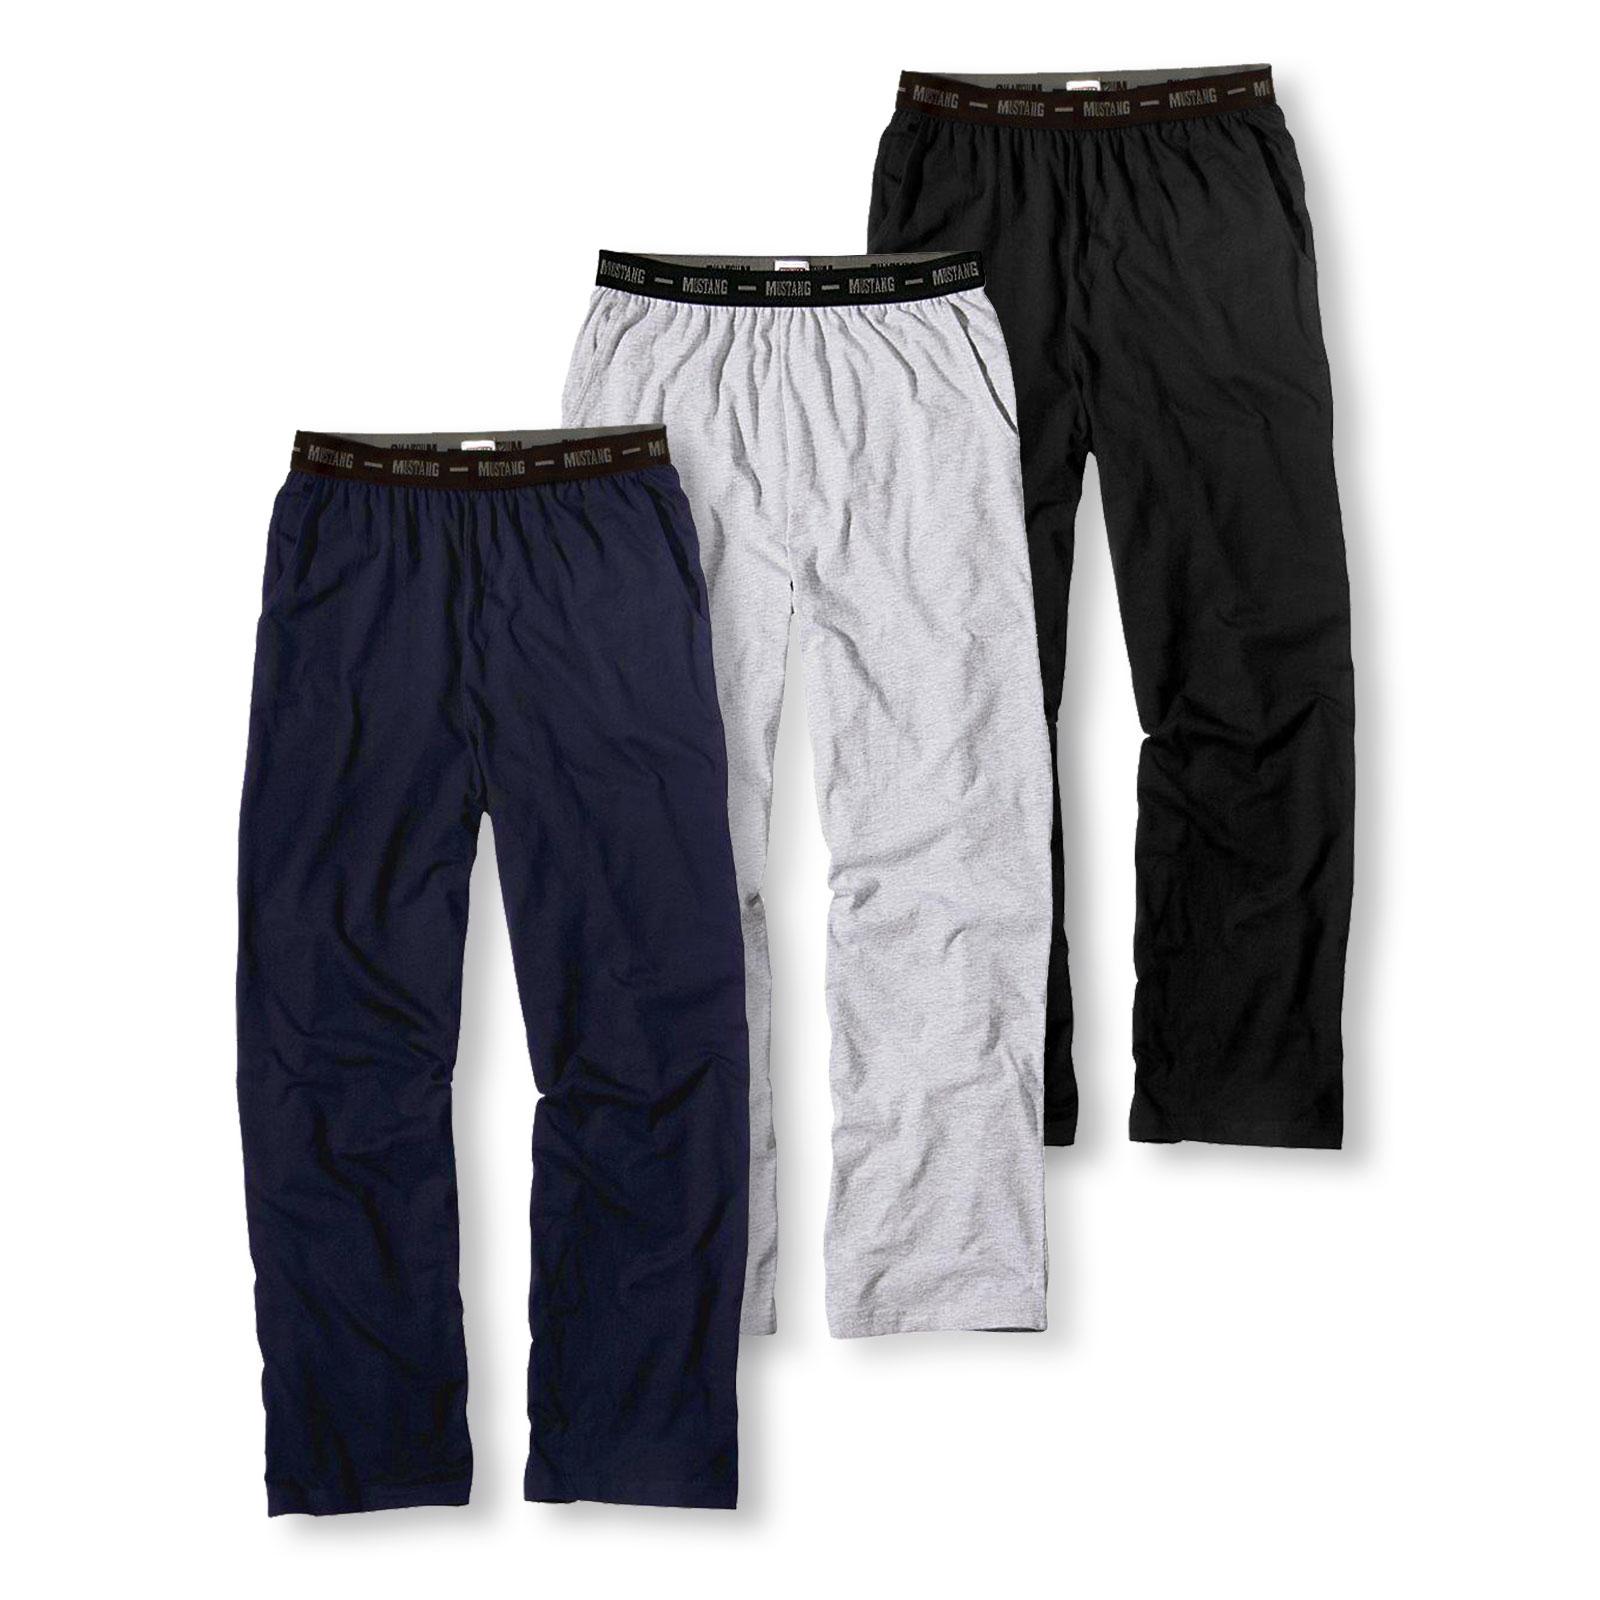 Mustang Herren Pyjamahose Schlafanzughose Lounge Pant Long Pant 4112-1700 in grey melange